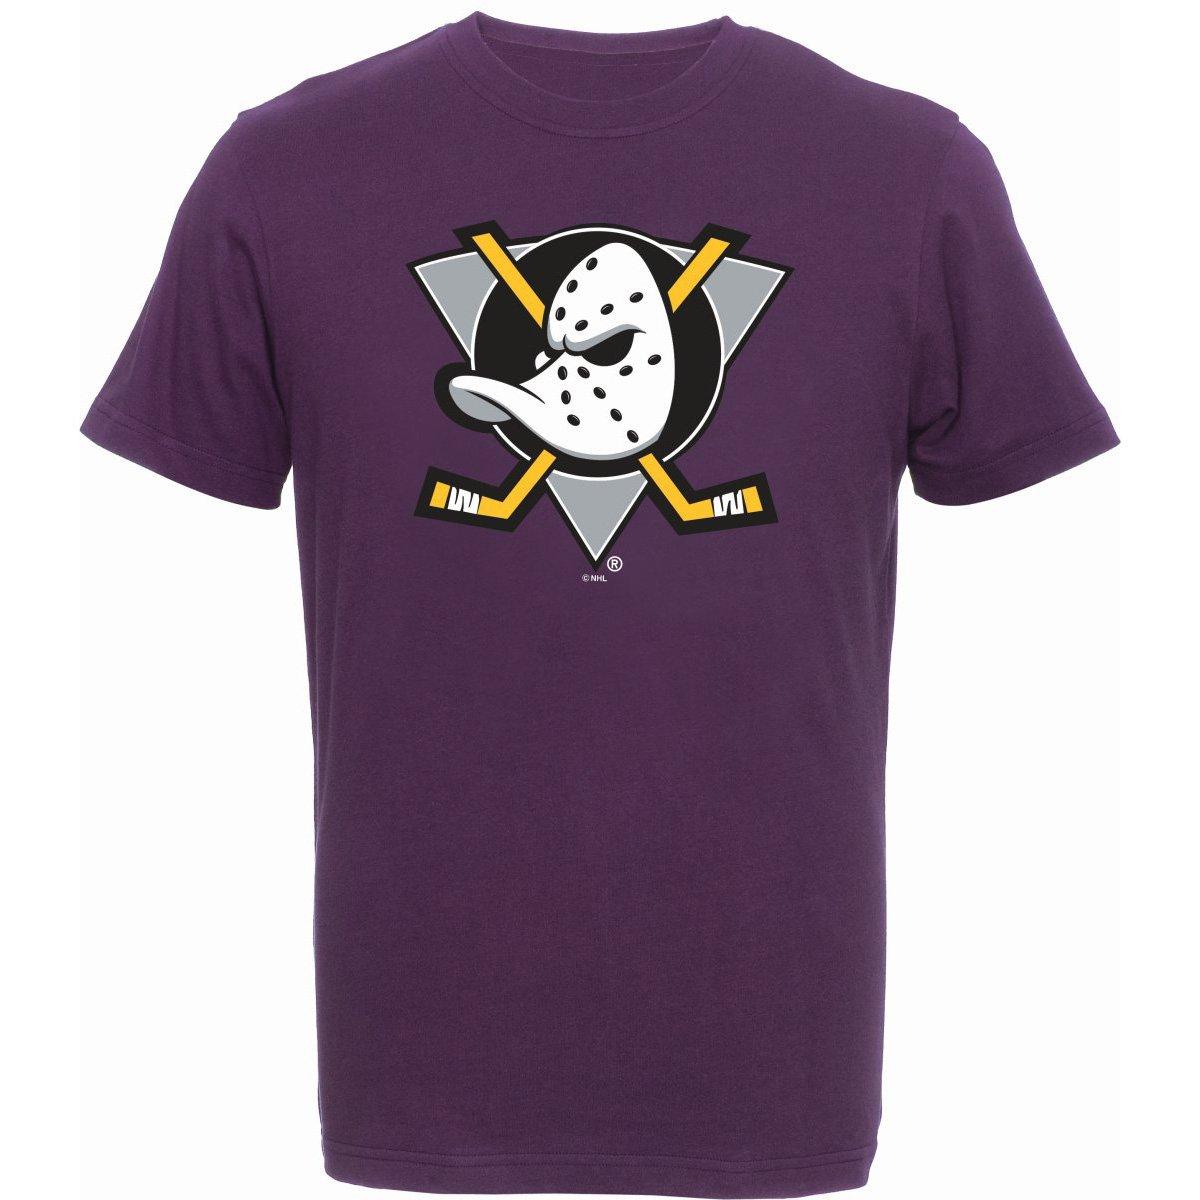 NHL T-Shirt ANAHEIM MIGHTY DUCKS Fanshirt lila Eishockey majestic athletics